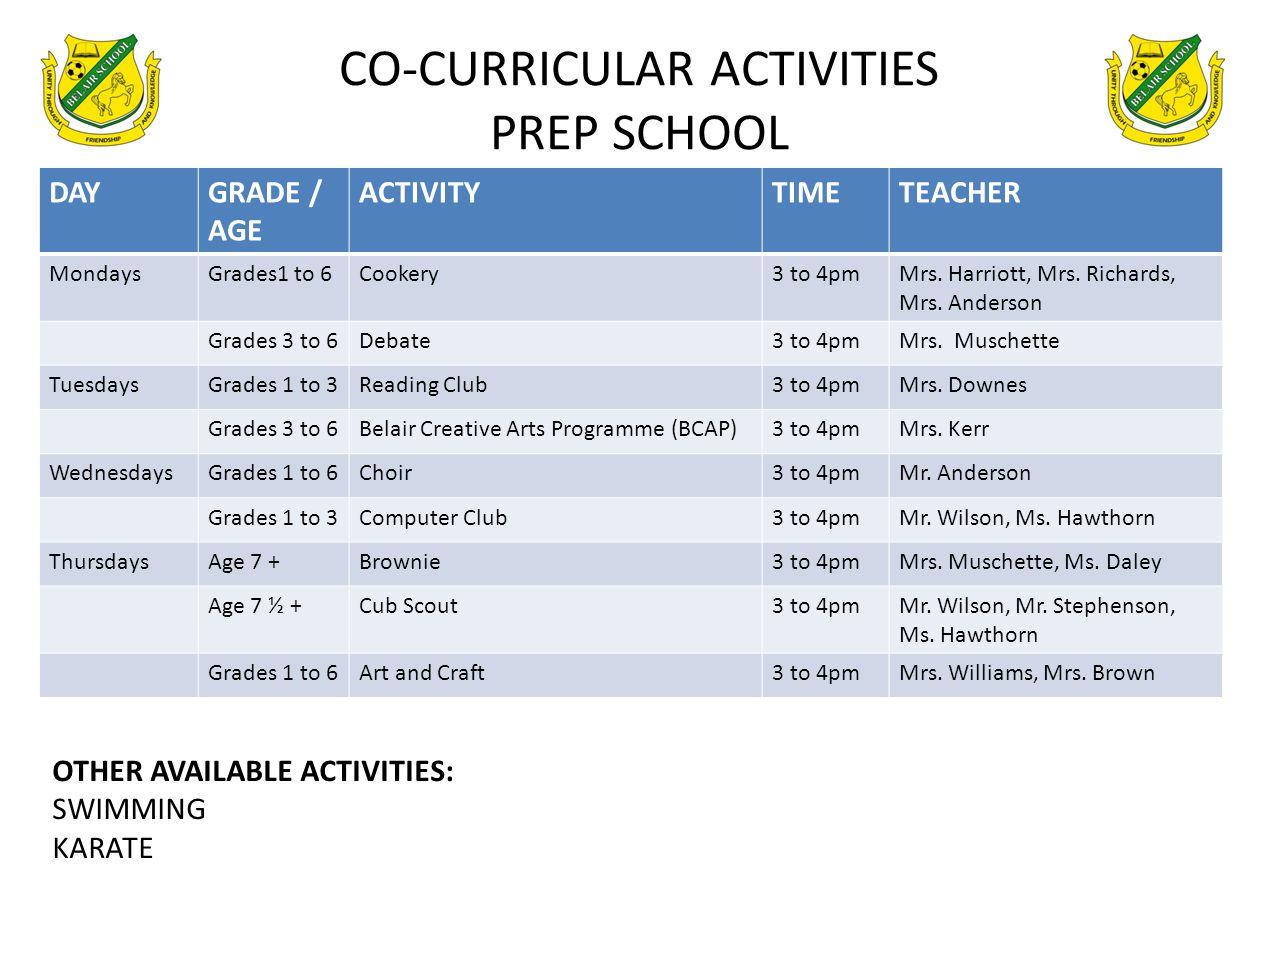 CO-CURRICULAR ACTIVITIES PREP SCHOOL DAYGRADE / AGE ACTIVITYTIMETEACHER MondaysGrades1 to 6Cookery3 to 4pmMrs. Harriott, Mrs. Richards, Mrs. Anderson